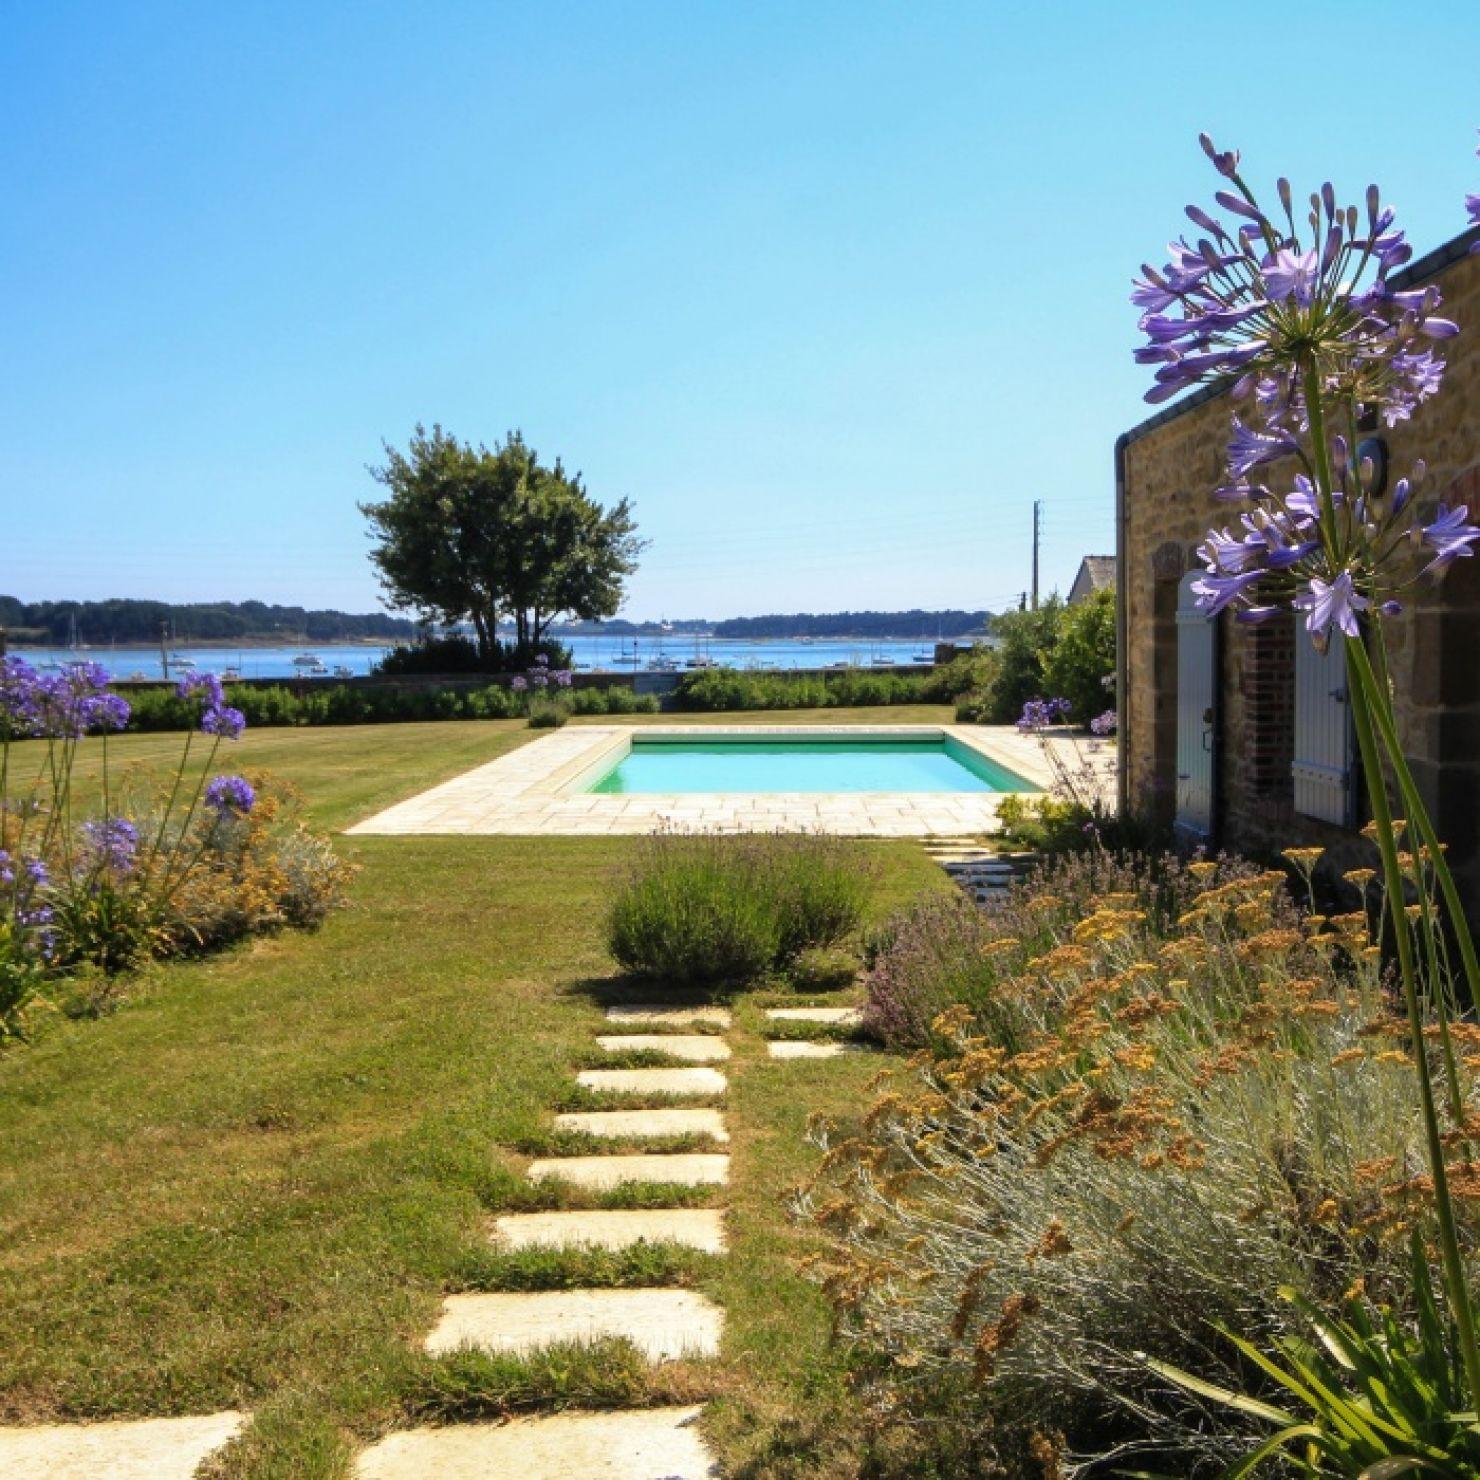 paysagiste vannes - aménagement de jardin et terrasse morbihan